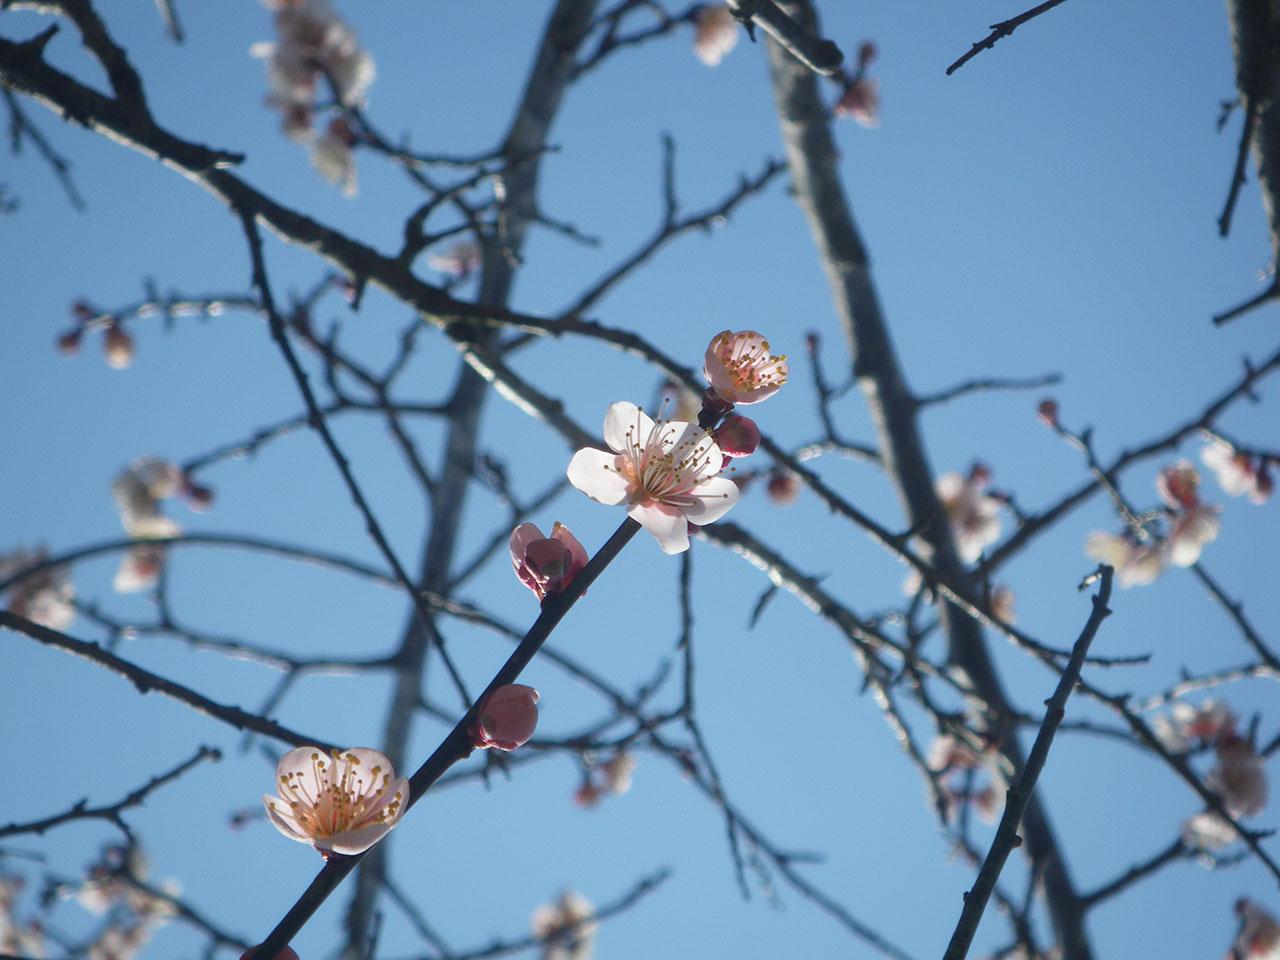 pentax w60で撮影した梅の花